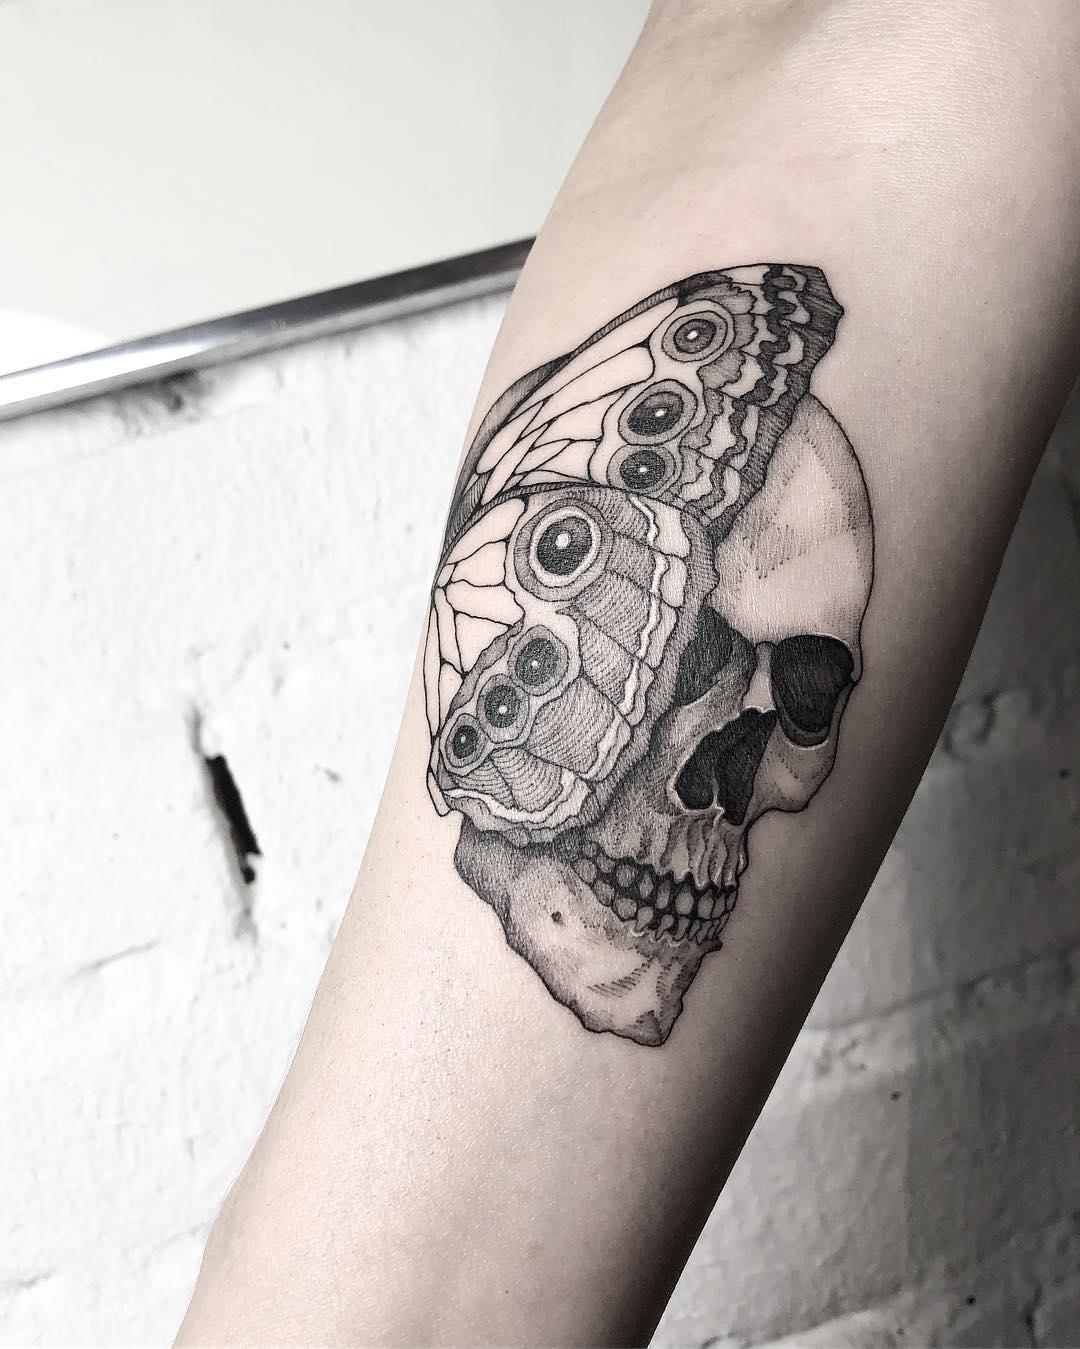 татуировка бабочки и черепа на руке